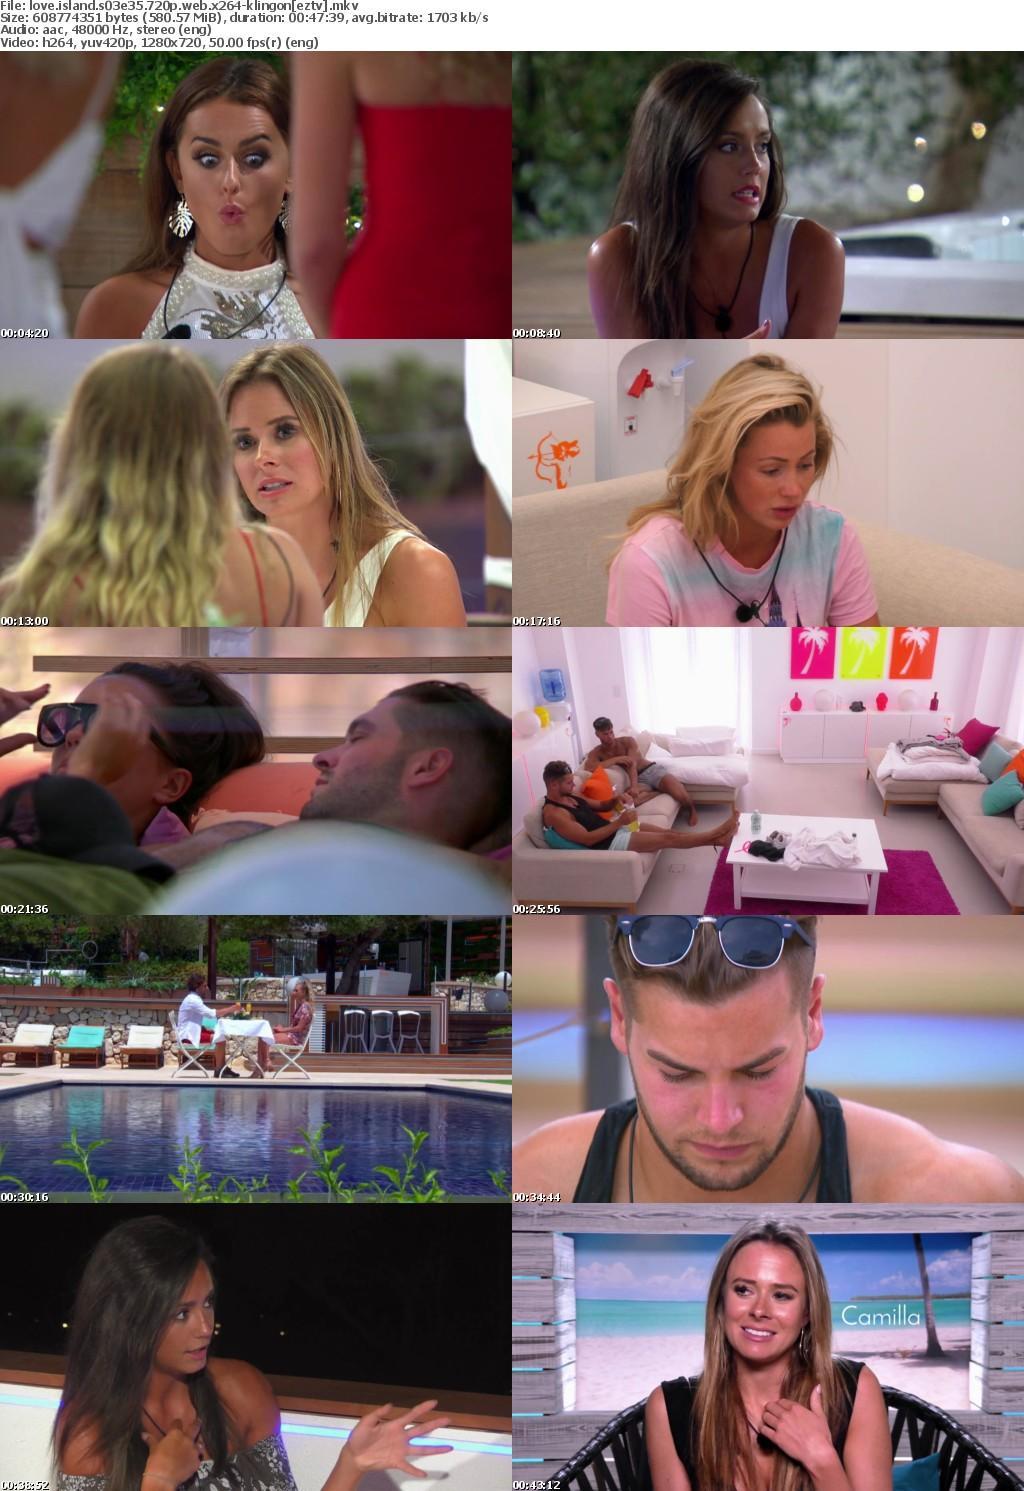 Love Island (2015) S03E35 720p WEB x264-KLINGON